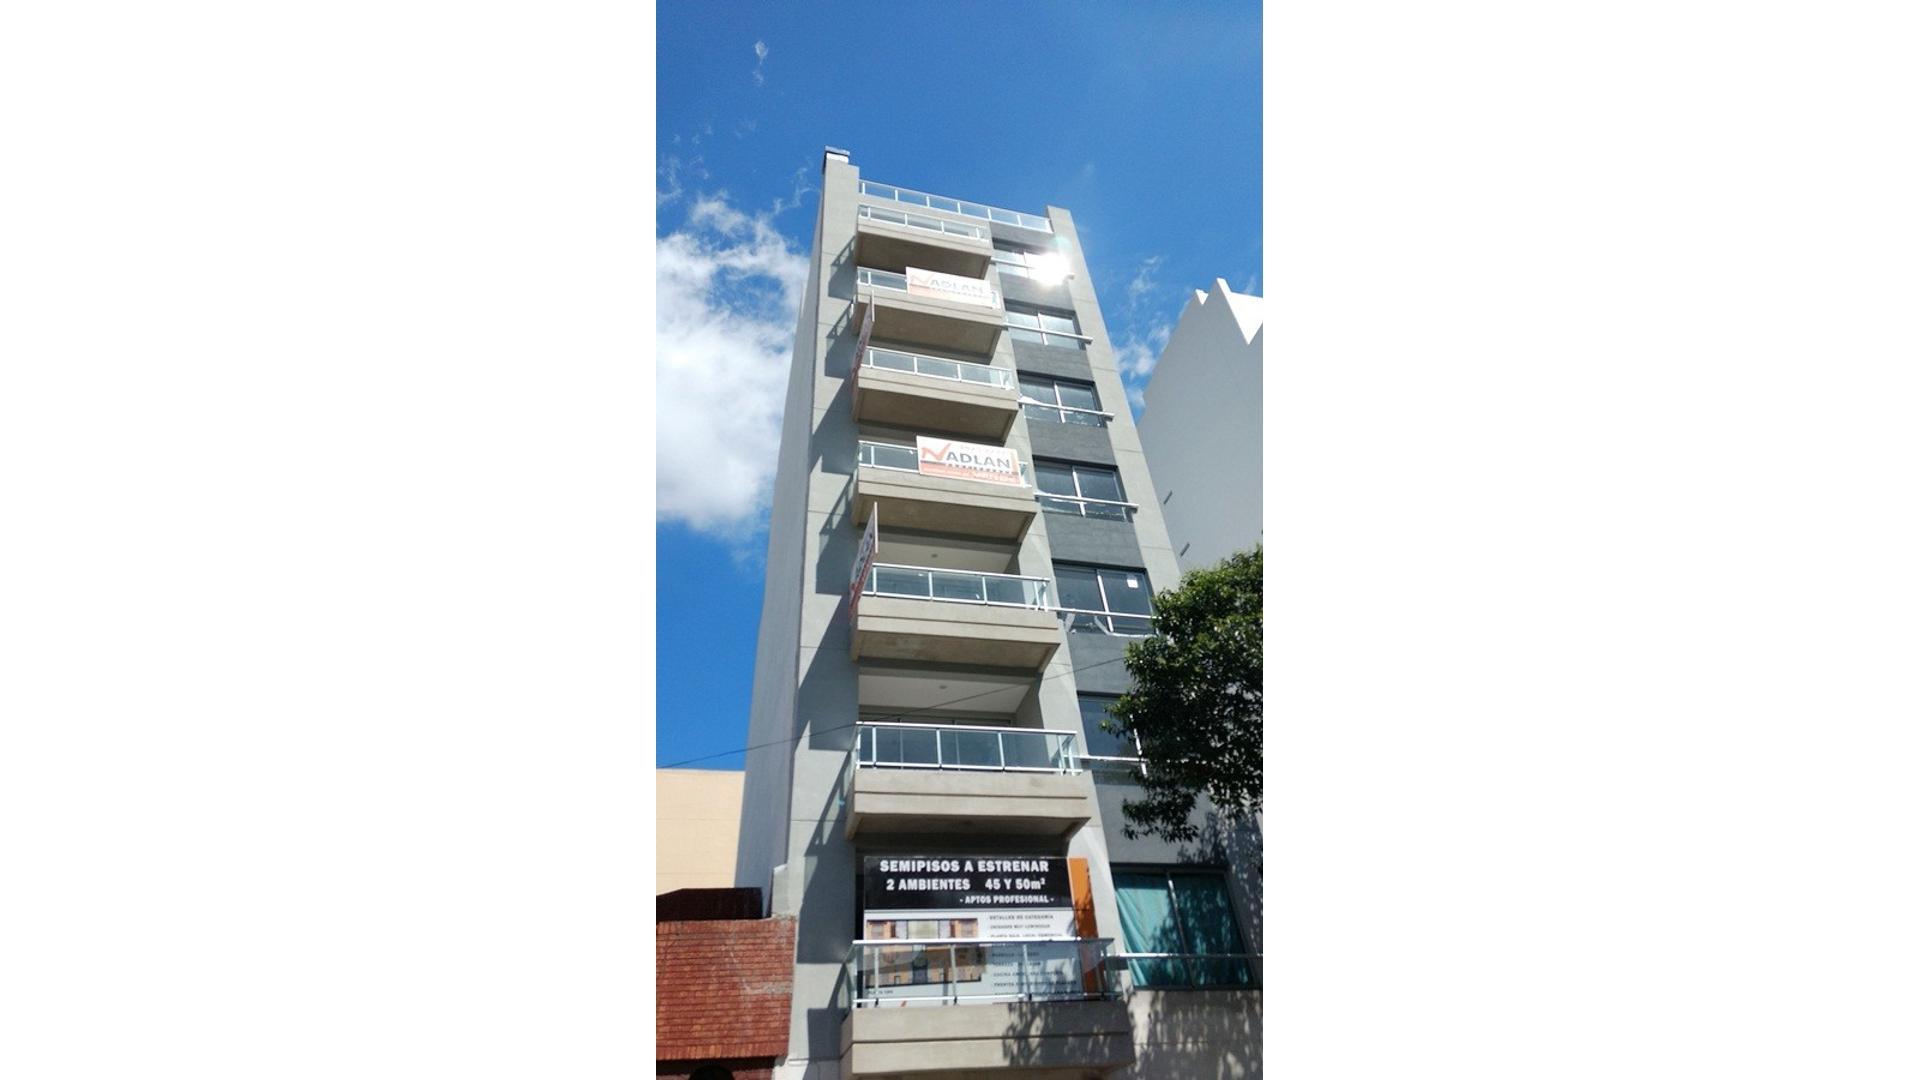 Almagro / Villa Crespo a Estrenar venta 2 ambientes 50m2 balcon aterrazado amenities posesion inmed